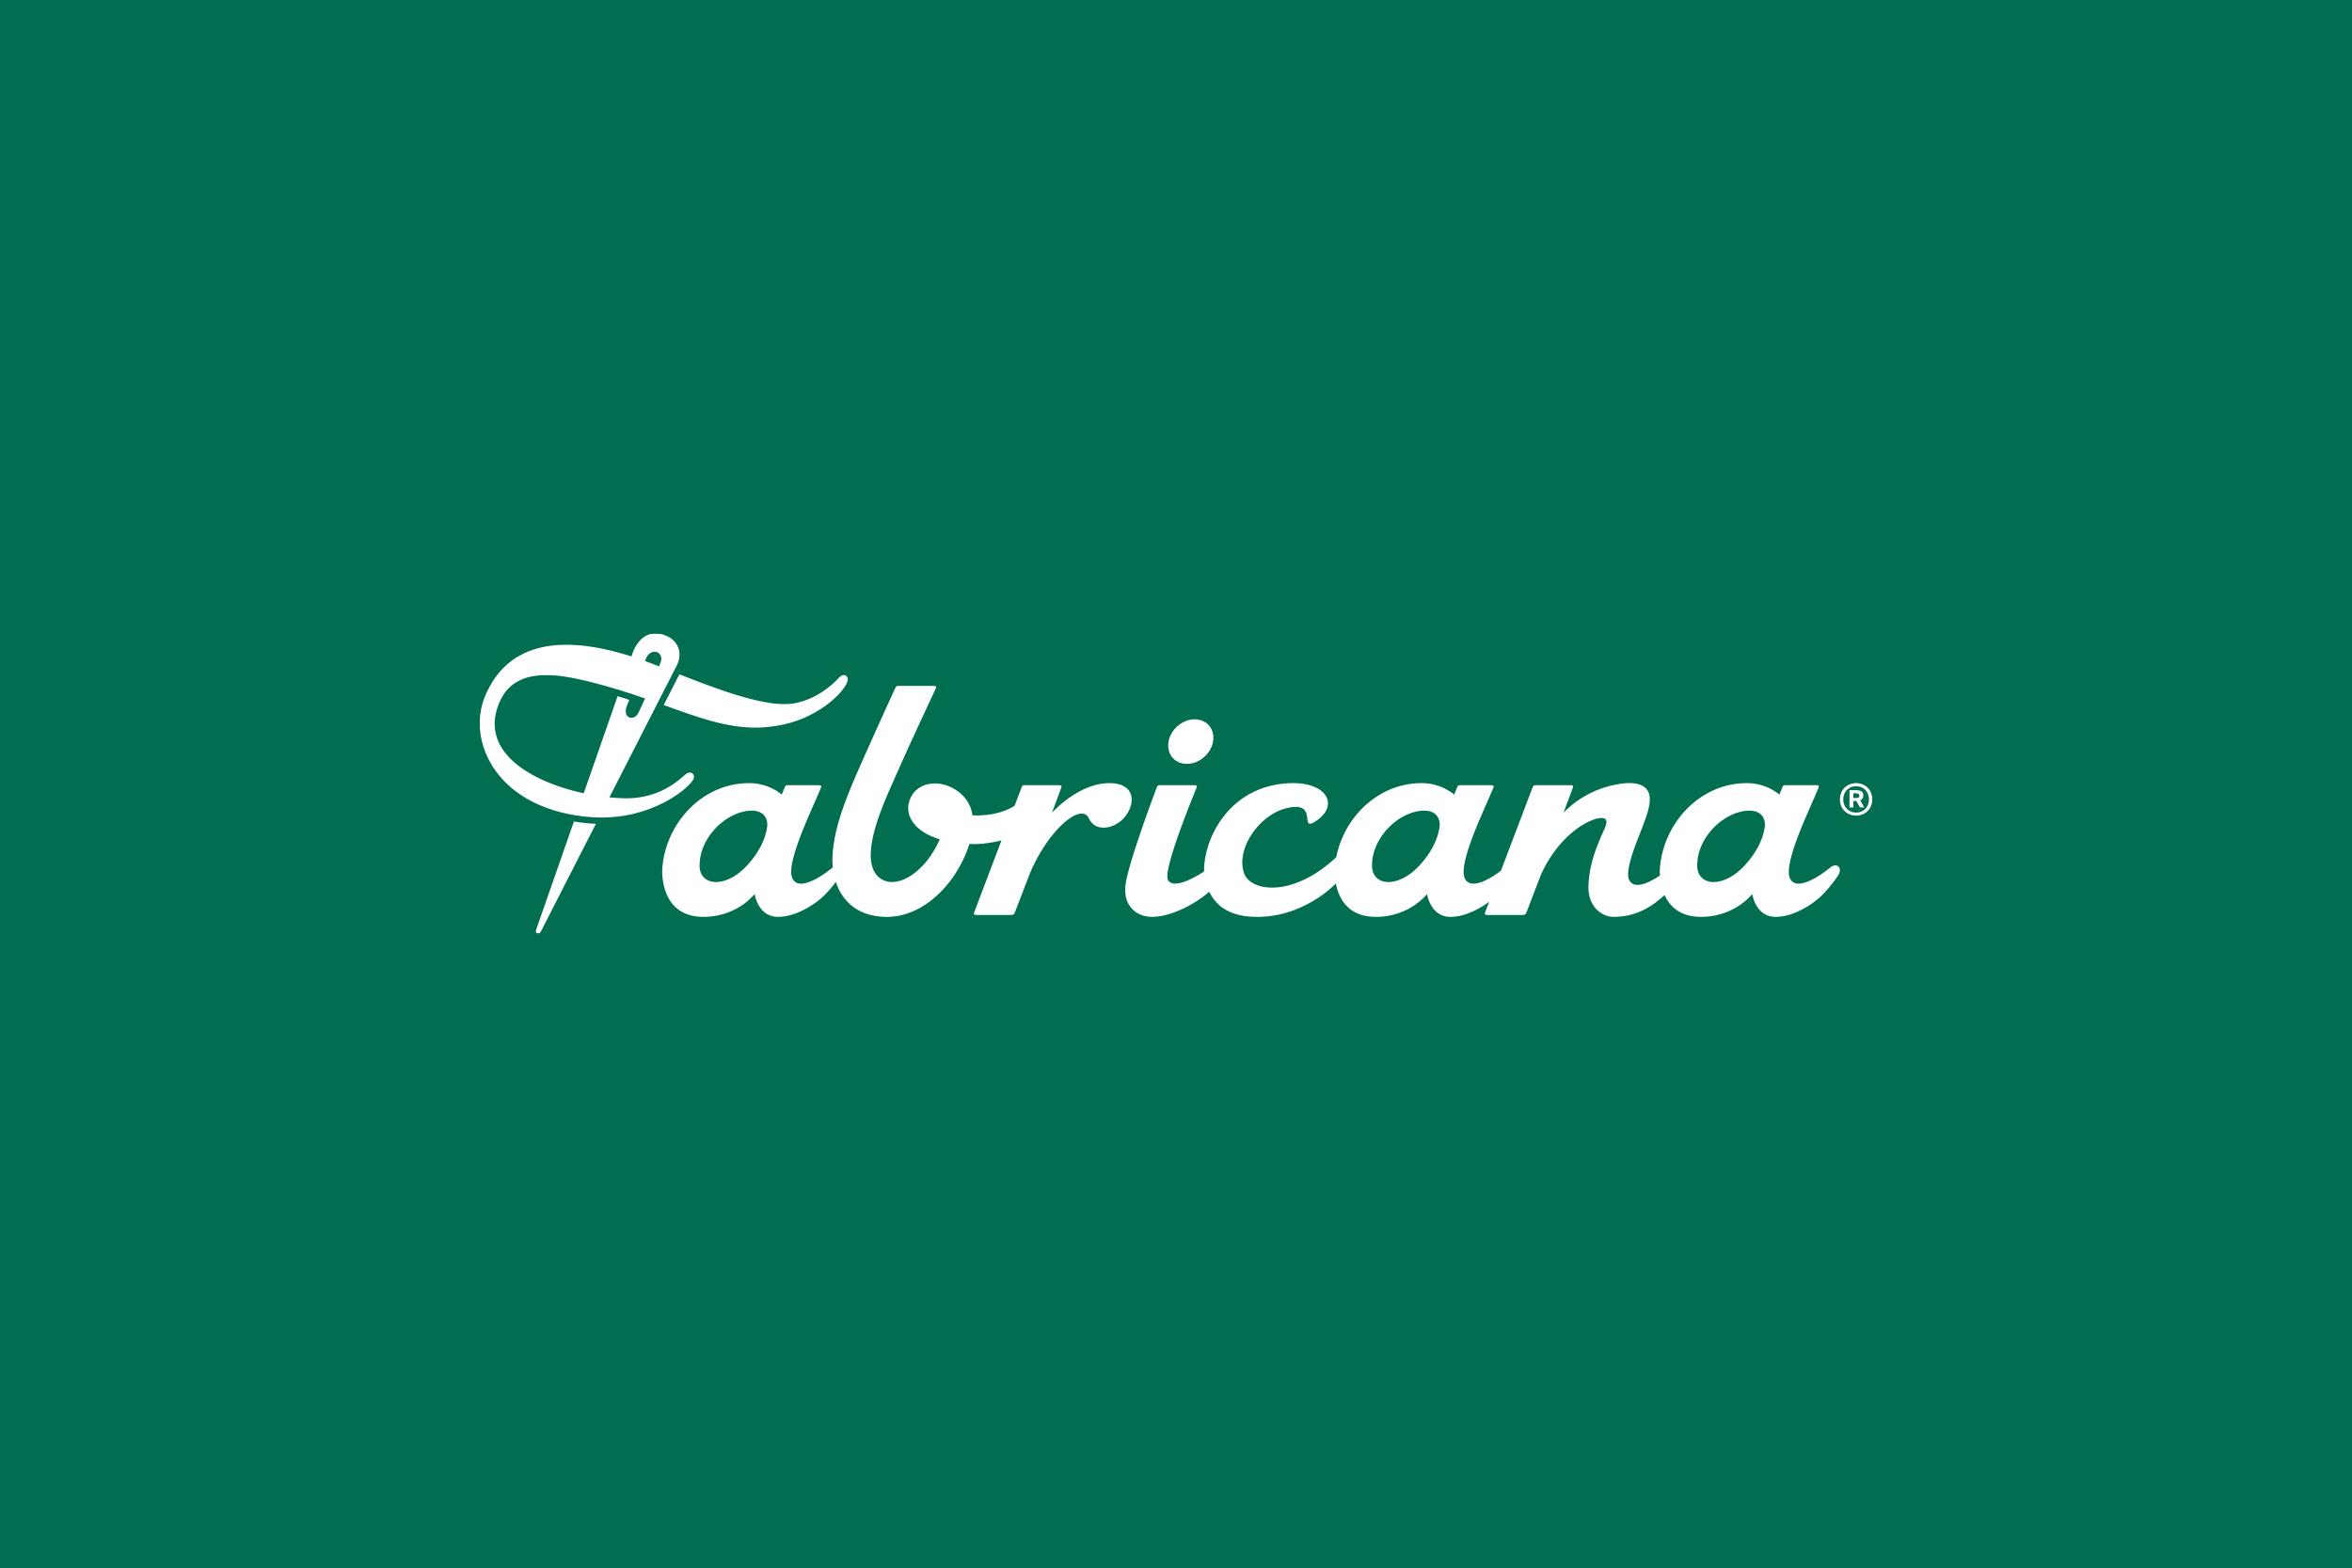 Fabricana - Coming Soon